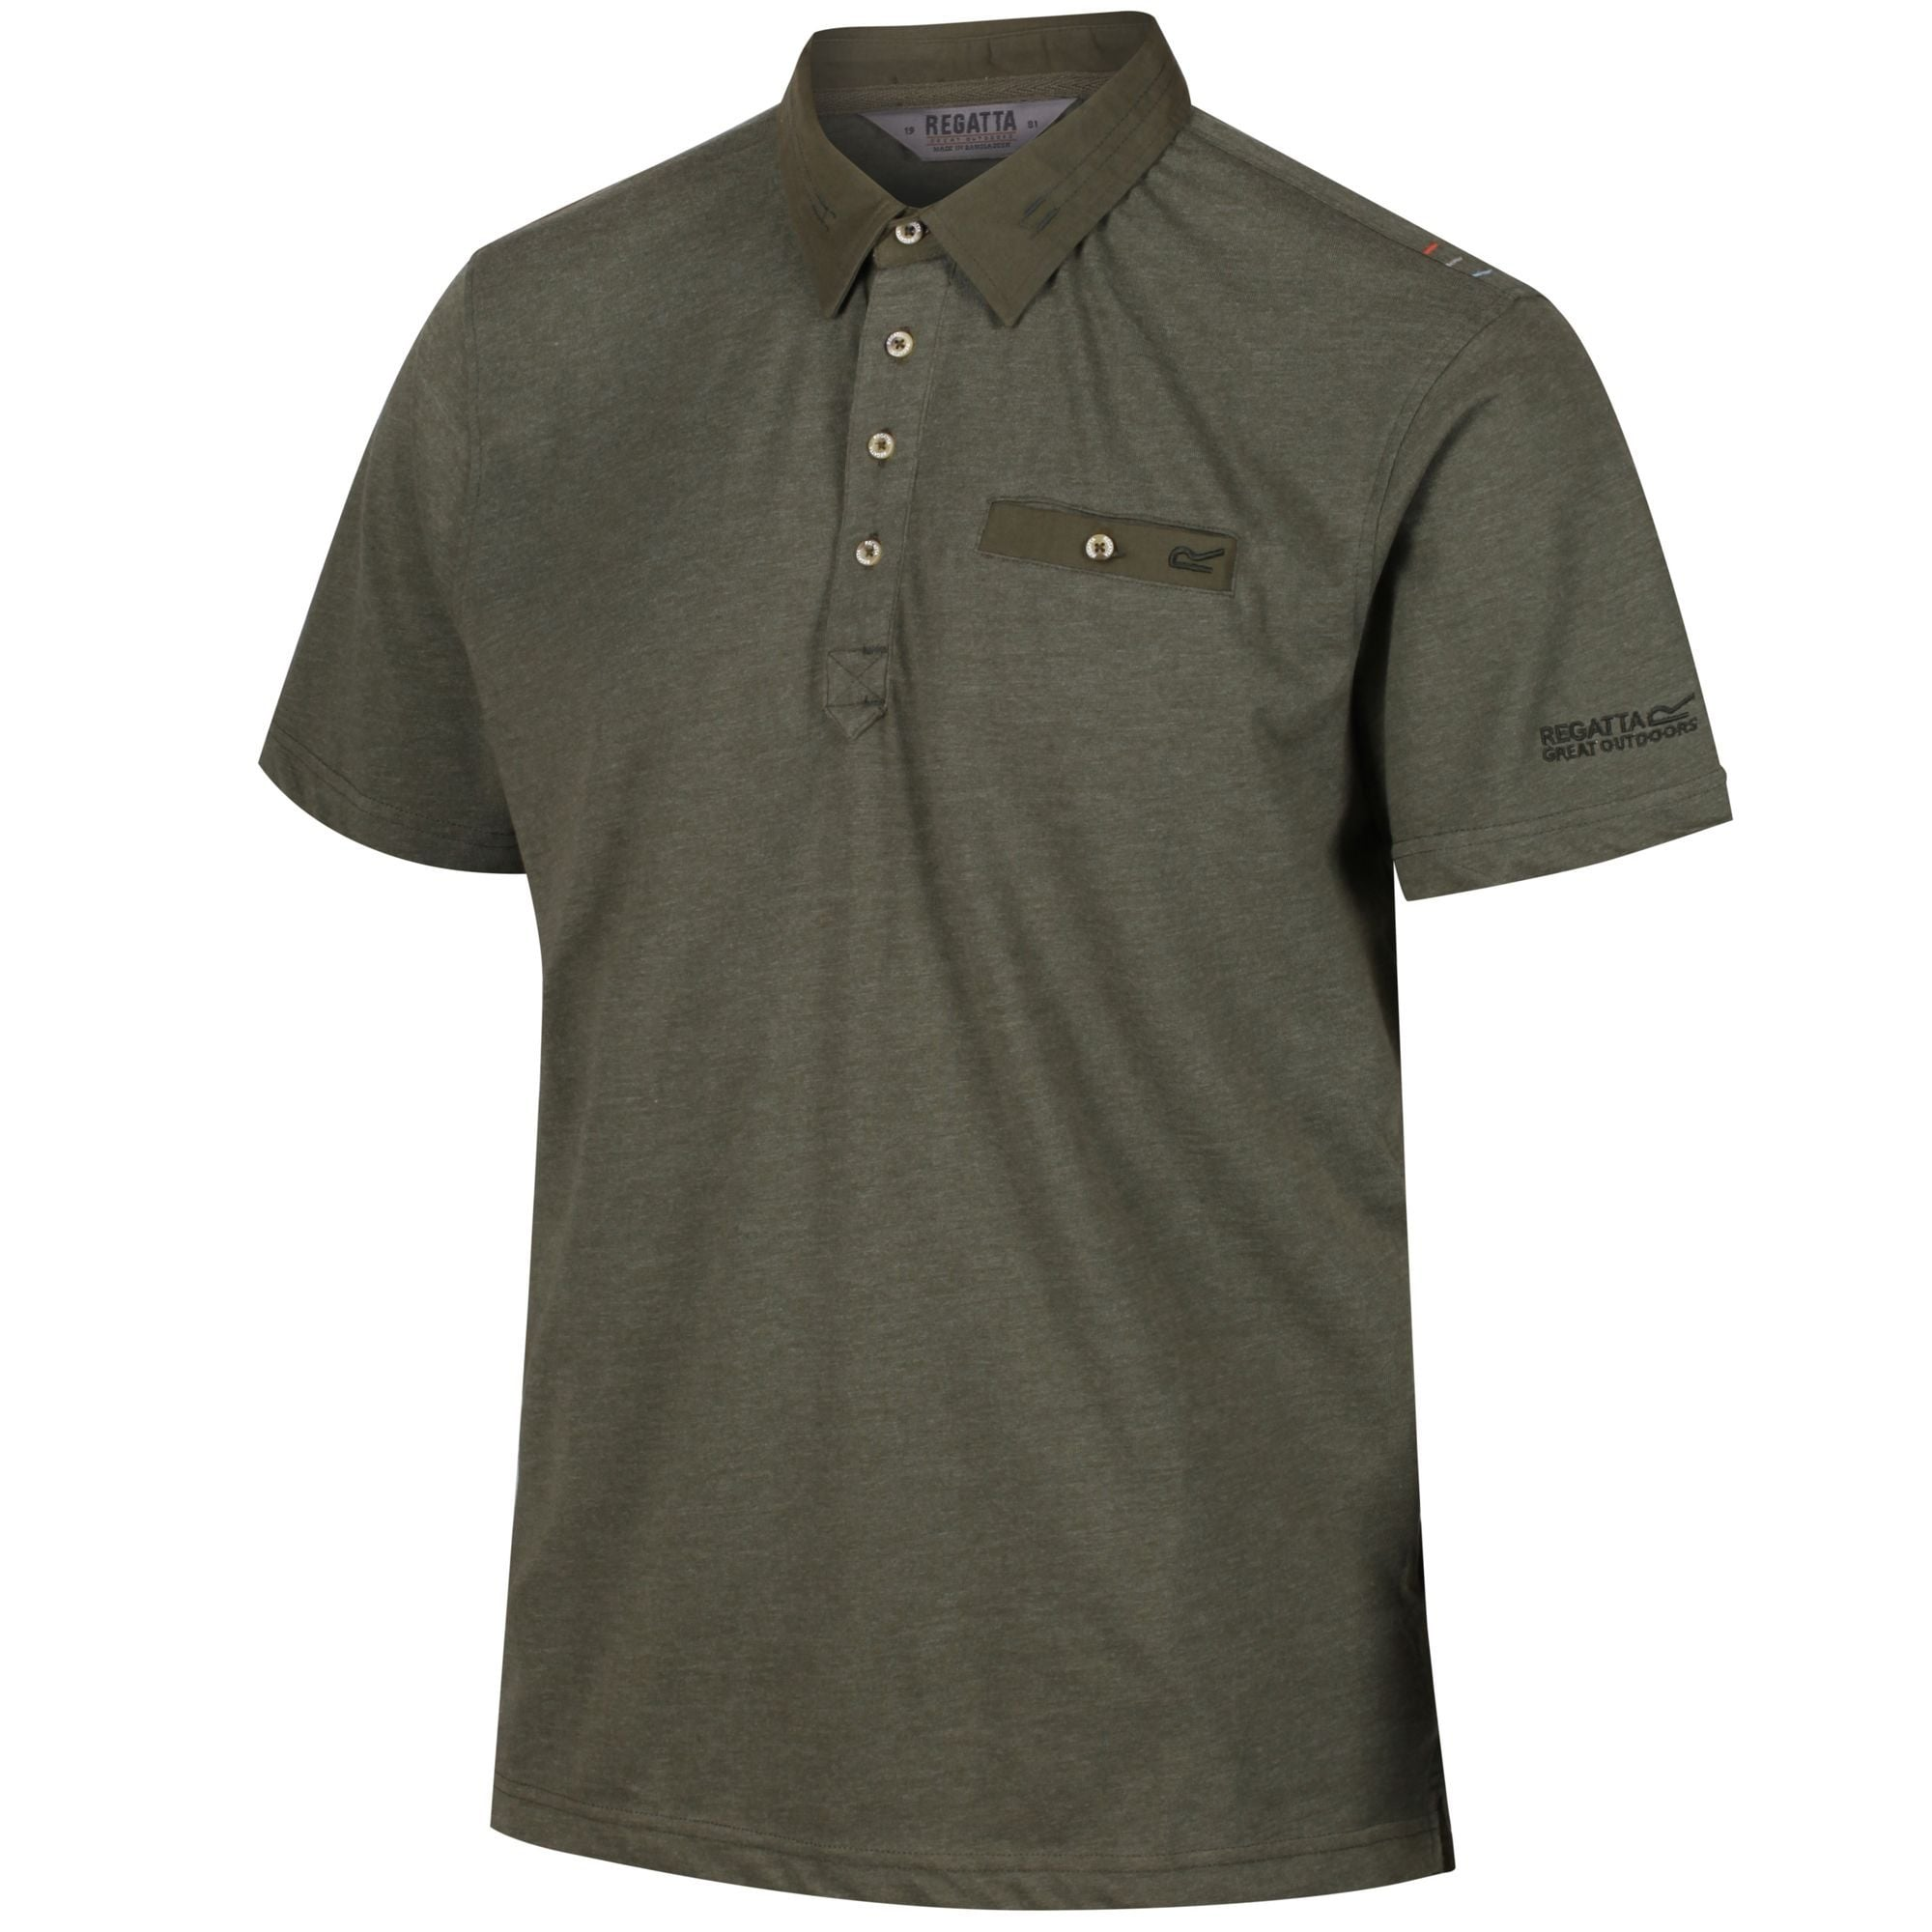 Regatta Coolweave Mens Polo Shirt Green